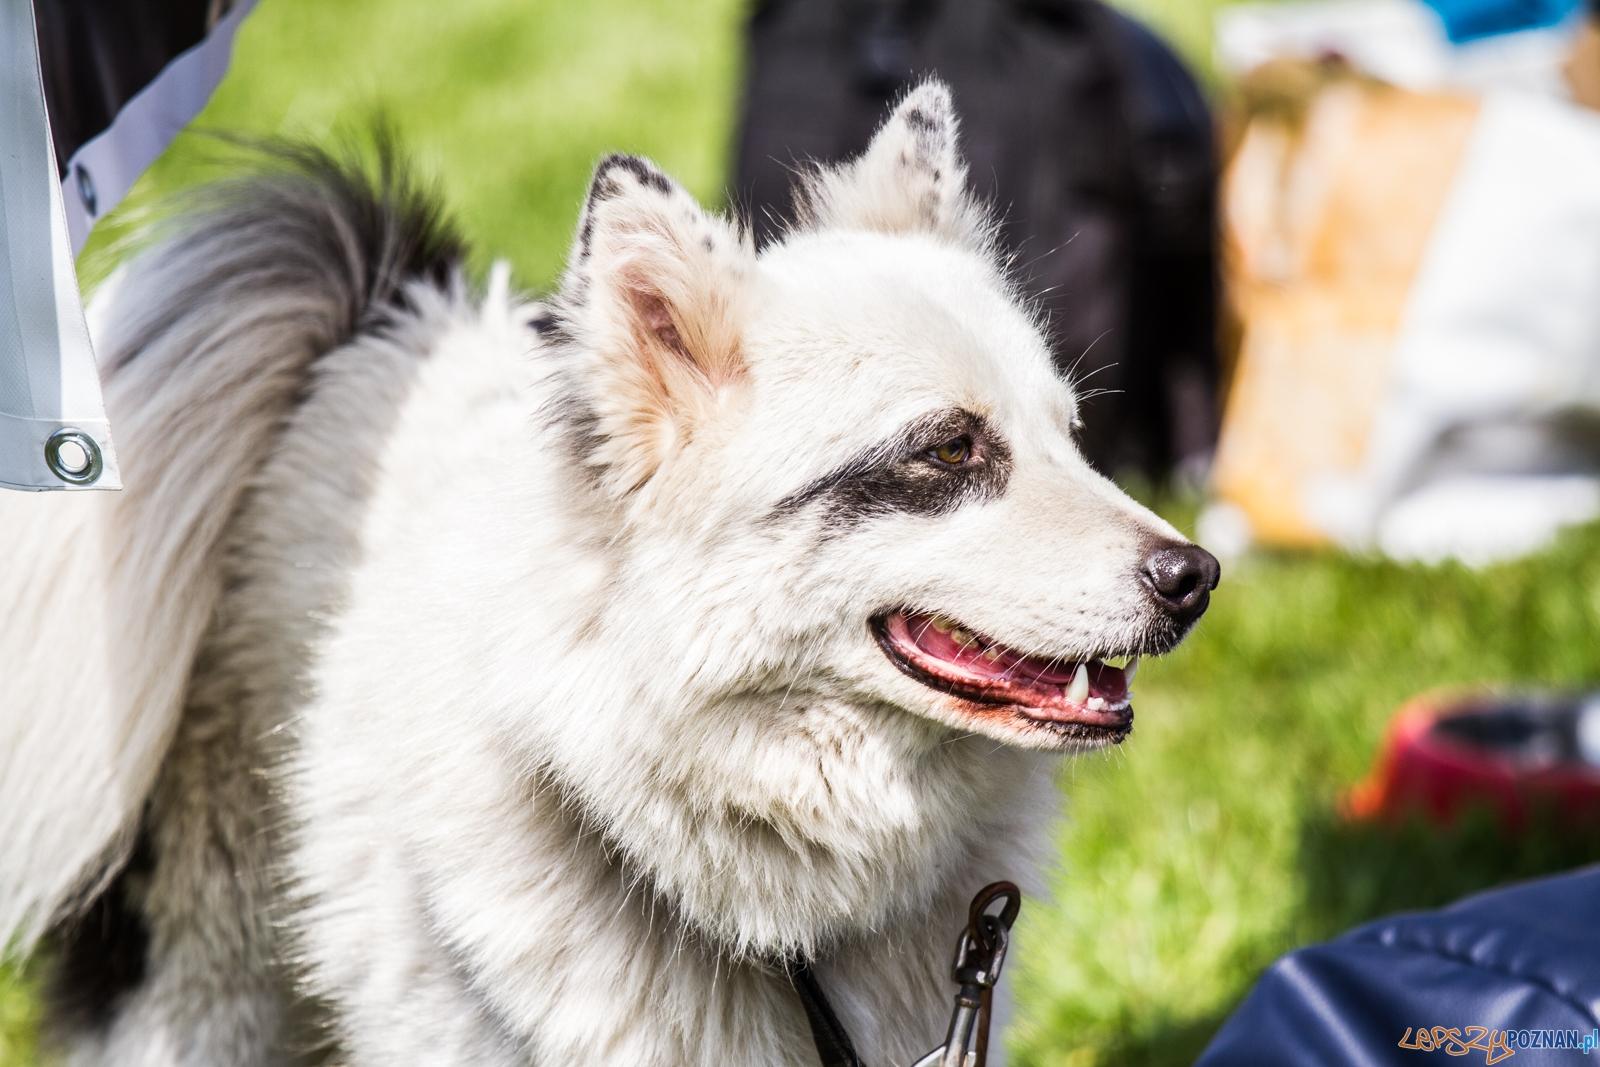 Latające psy (13.05.2017)  Foto: © lepszyPOZNAN.pl / Karolina Kiraga